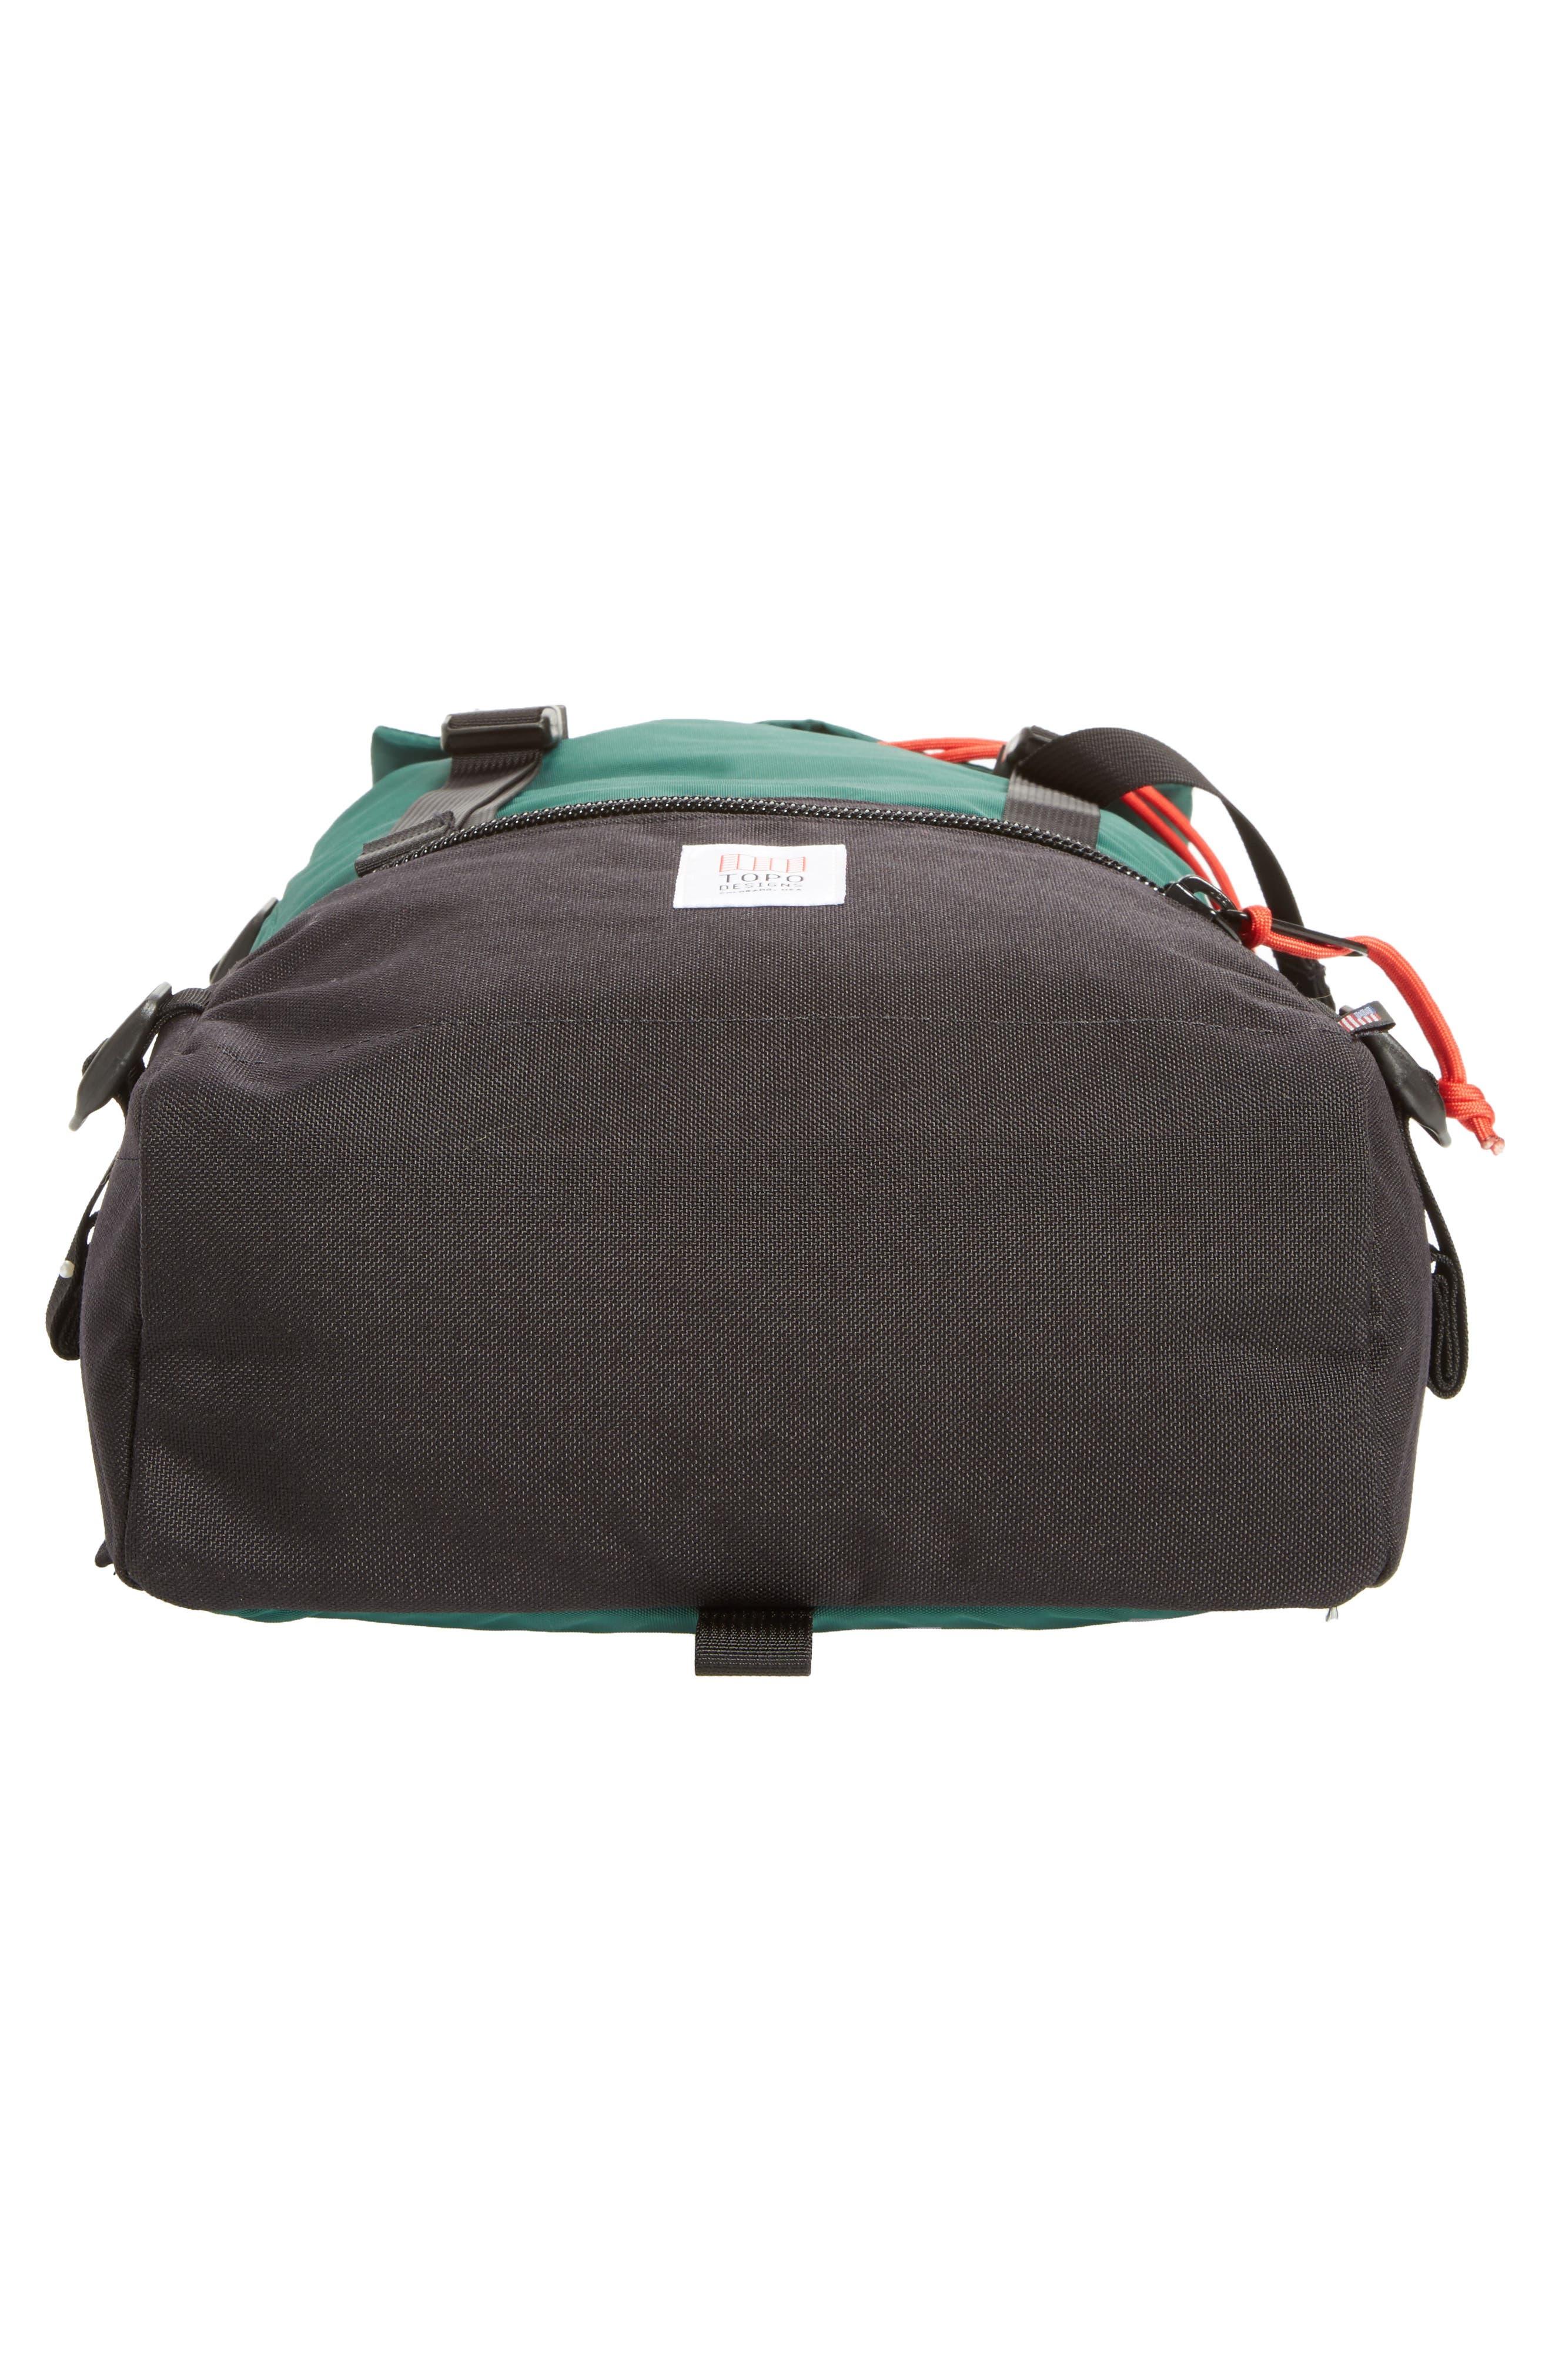 Rover Backpack,                             Alternate thumbnail 6, color,                             FOREST/ BLACK